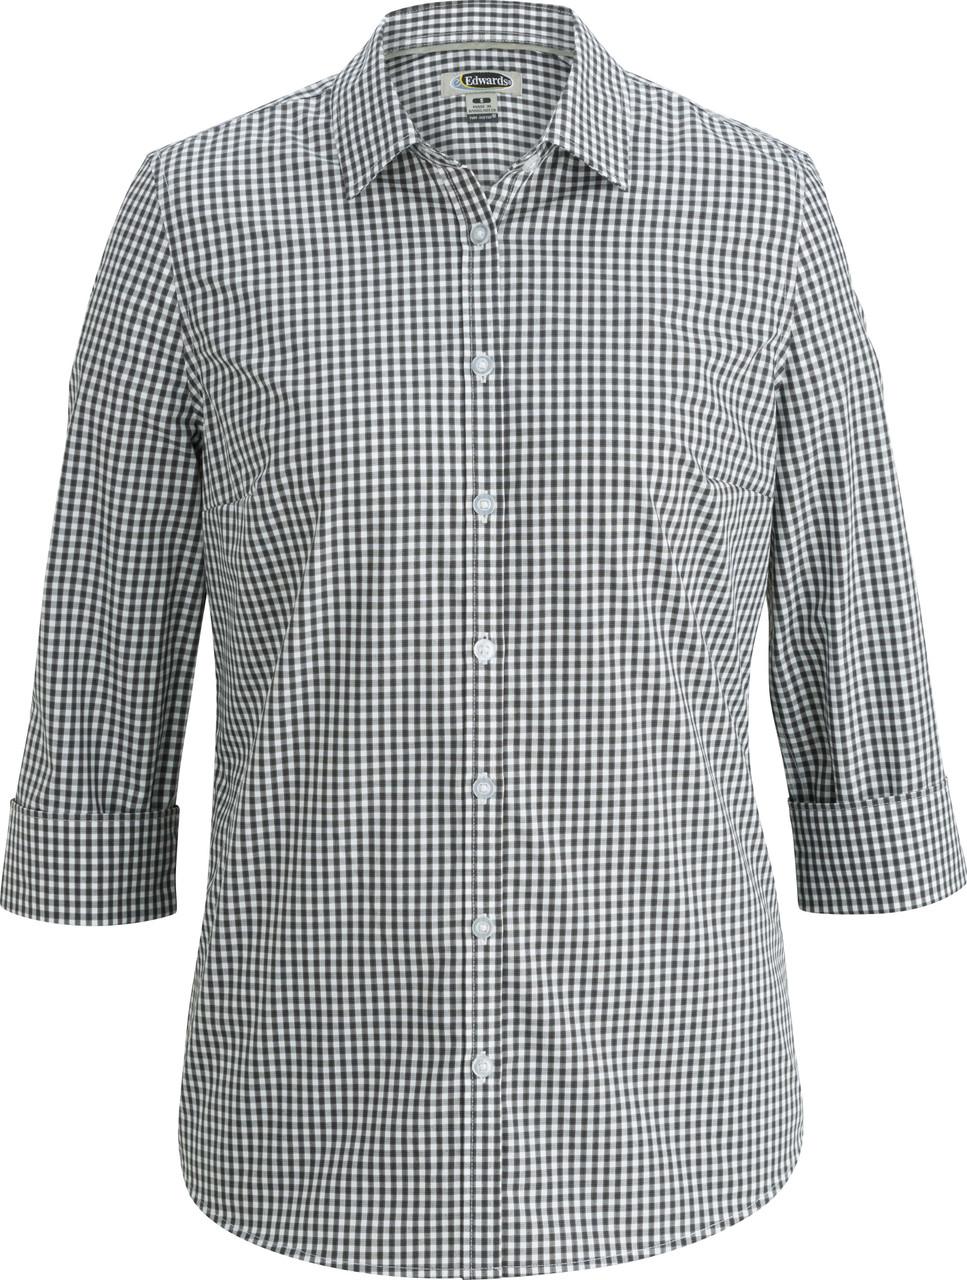 Women's No Iron Stretch Broadcloth Uniform Shirt